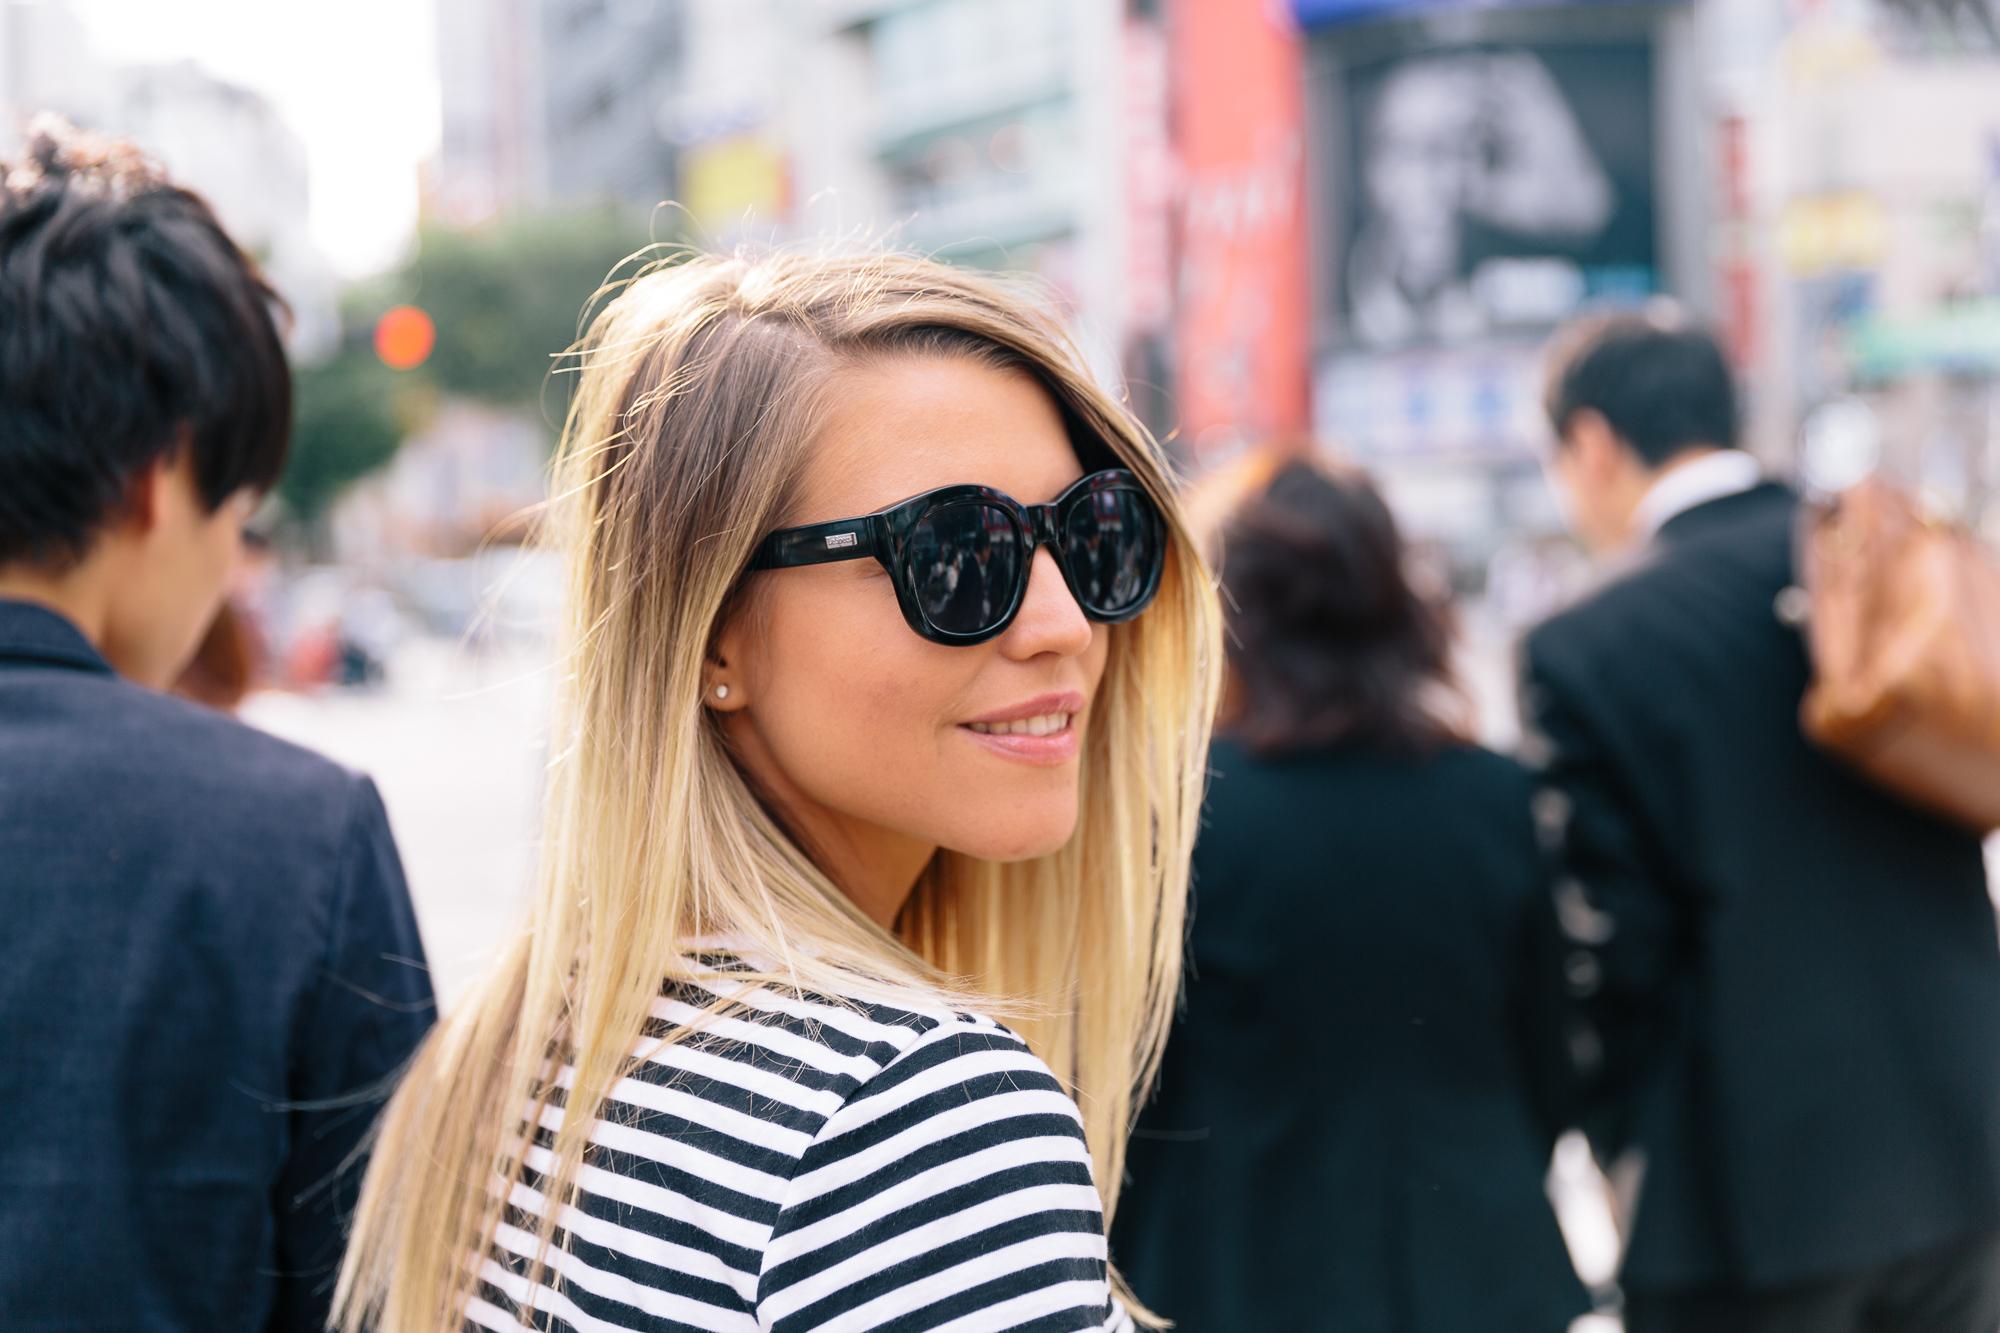 Melissa_Findley-1-8